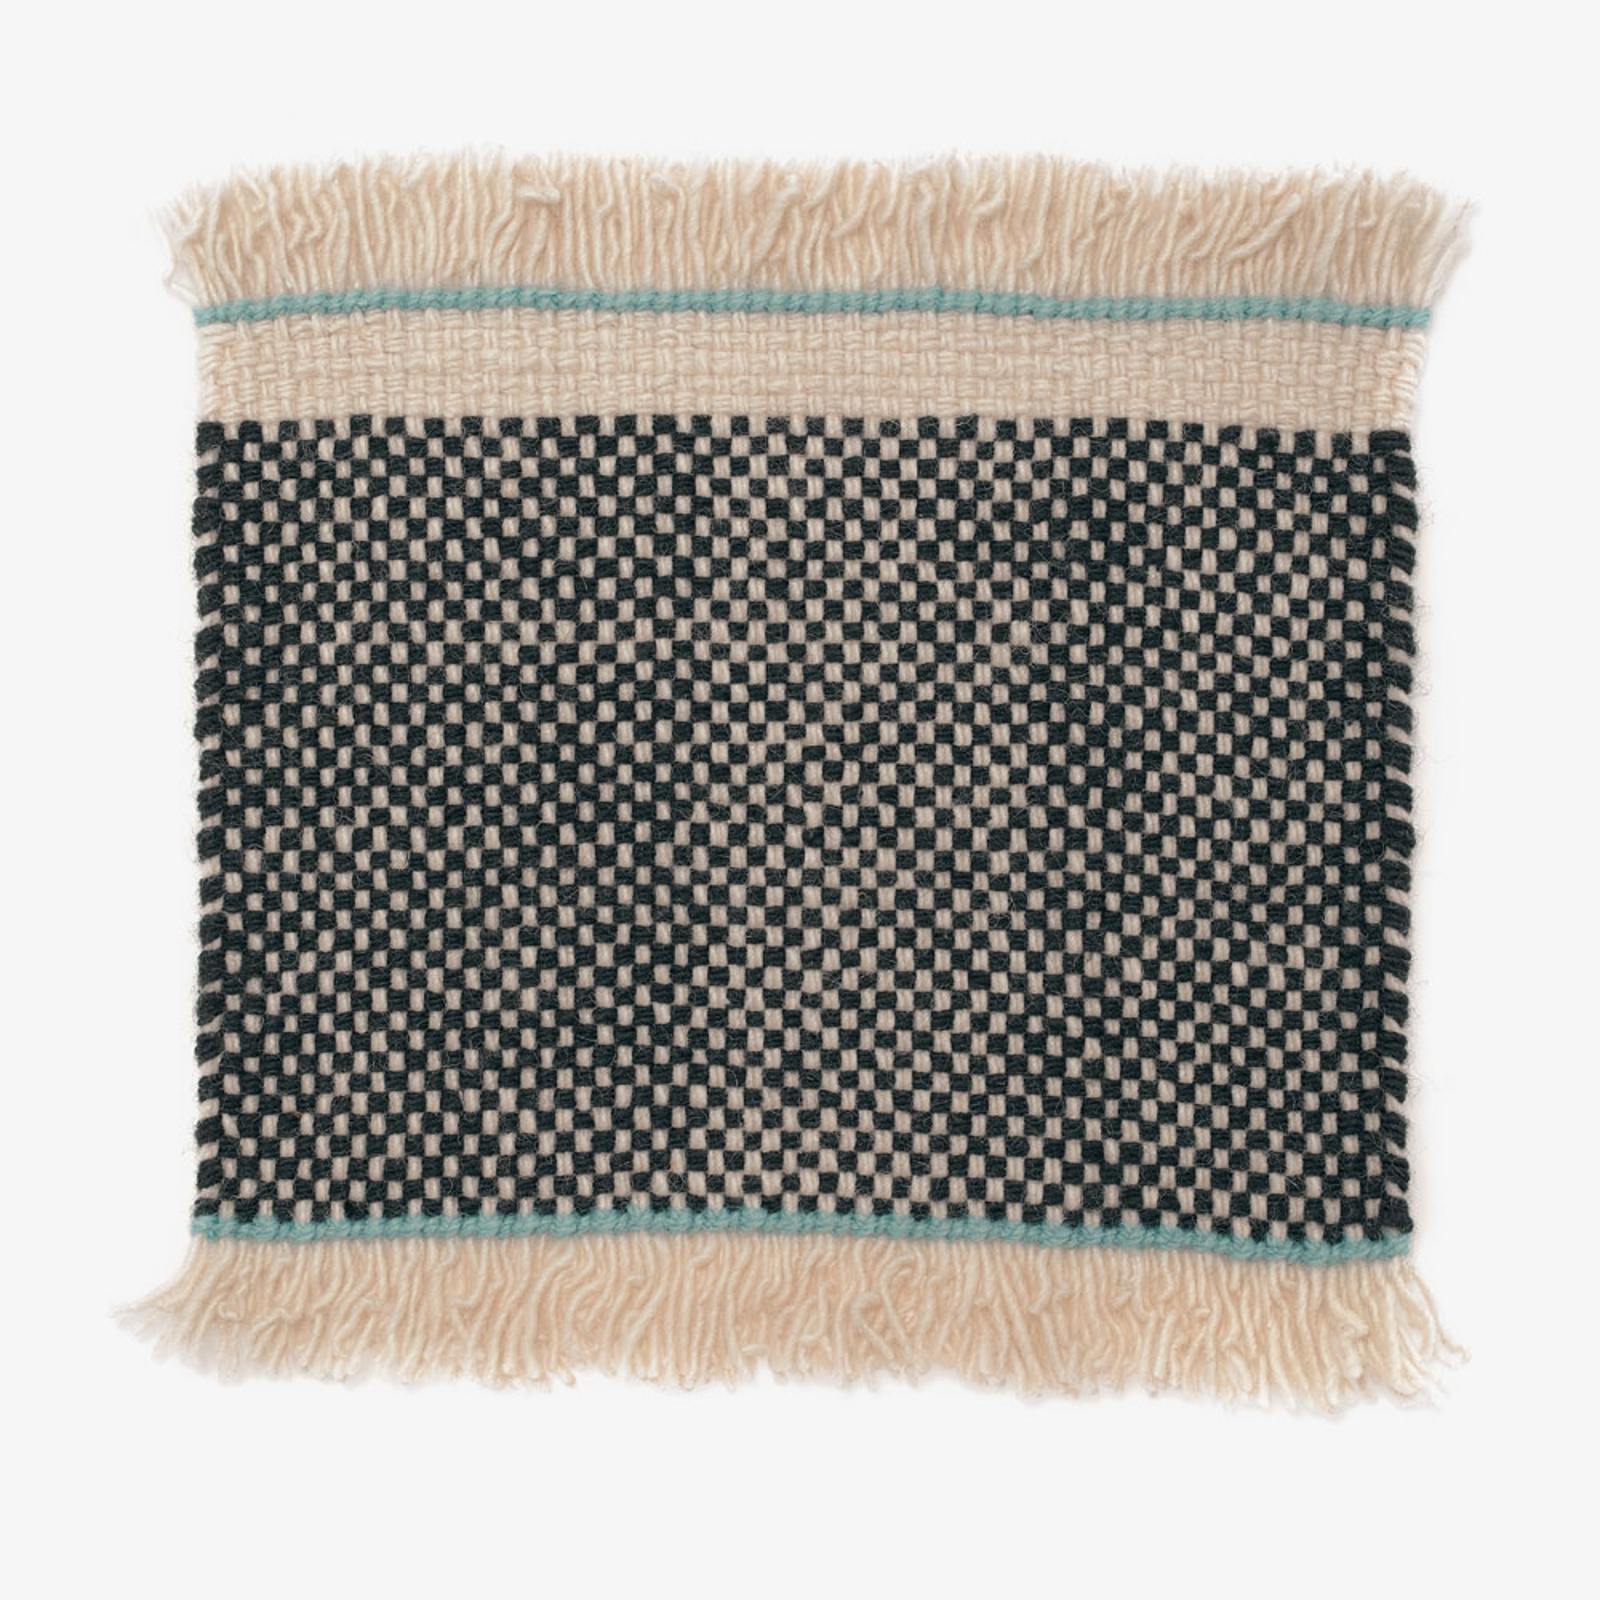 Kvadrat Rugs - Duotone - Farbe 0191 - Detailansicht